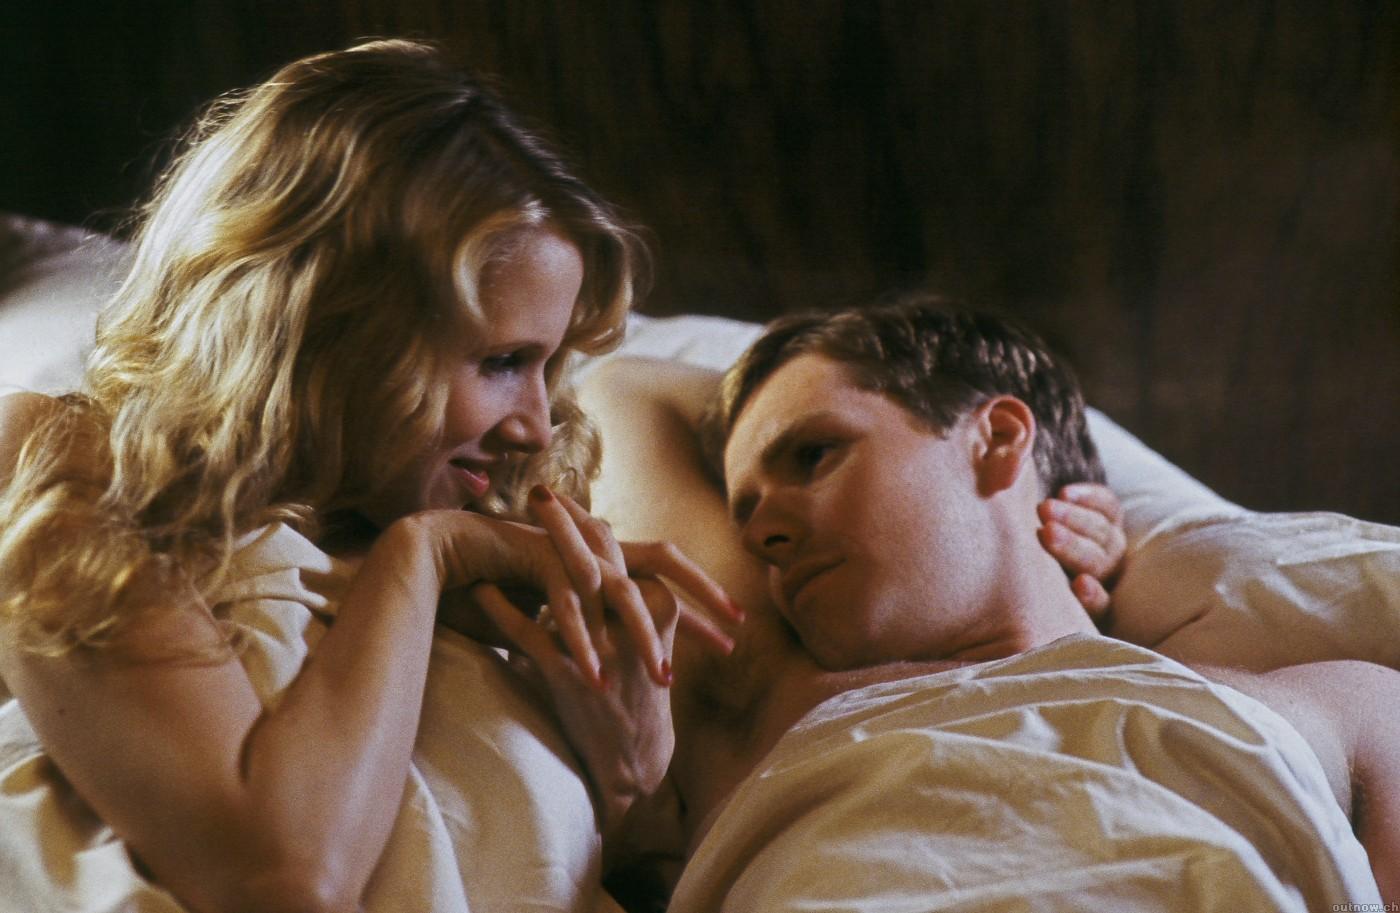 Эро фото из фильма любовники розмари — img 2